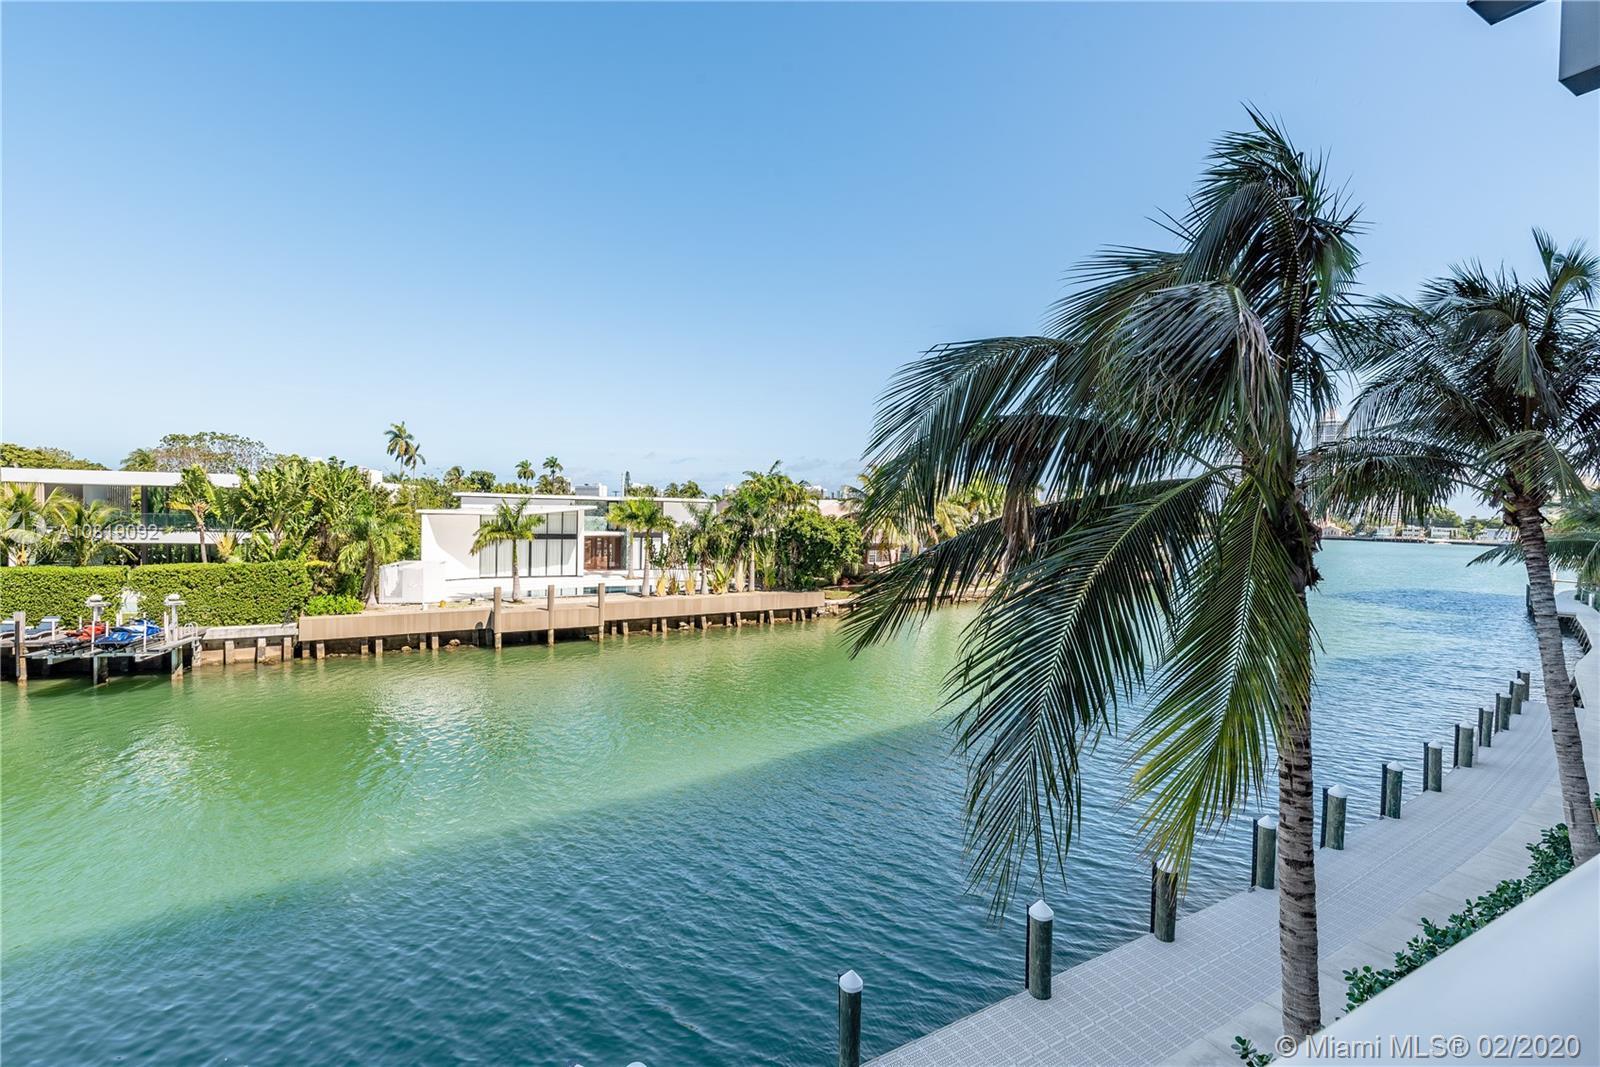 4701 N Meridian Ave Unit 322, Miami Beach FL 33140